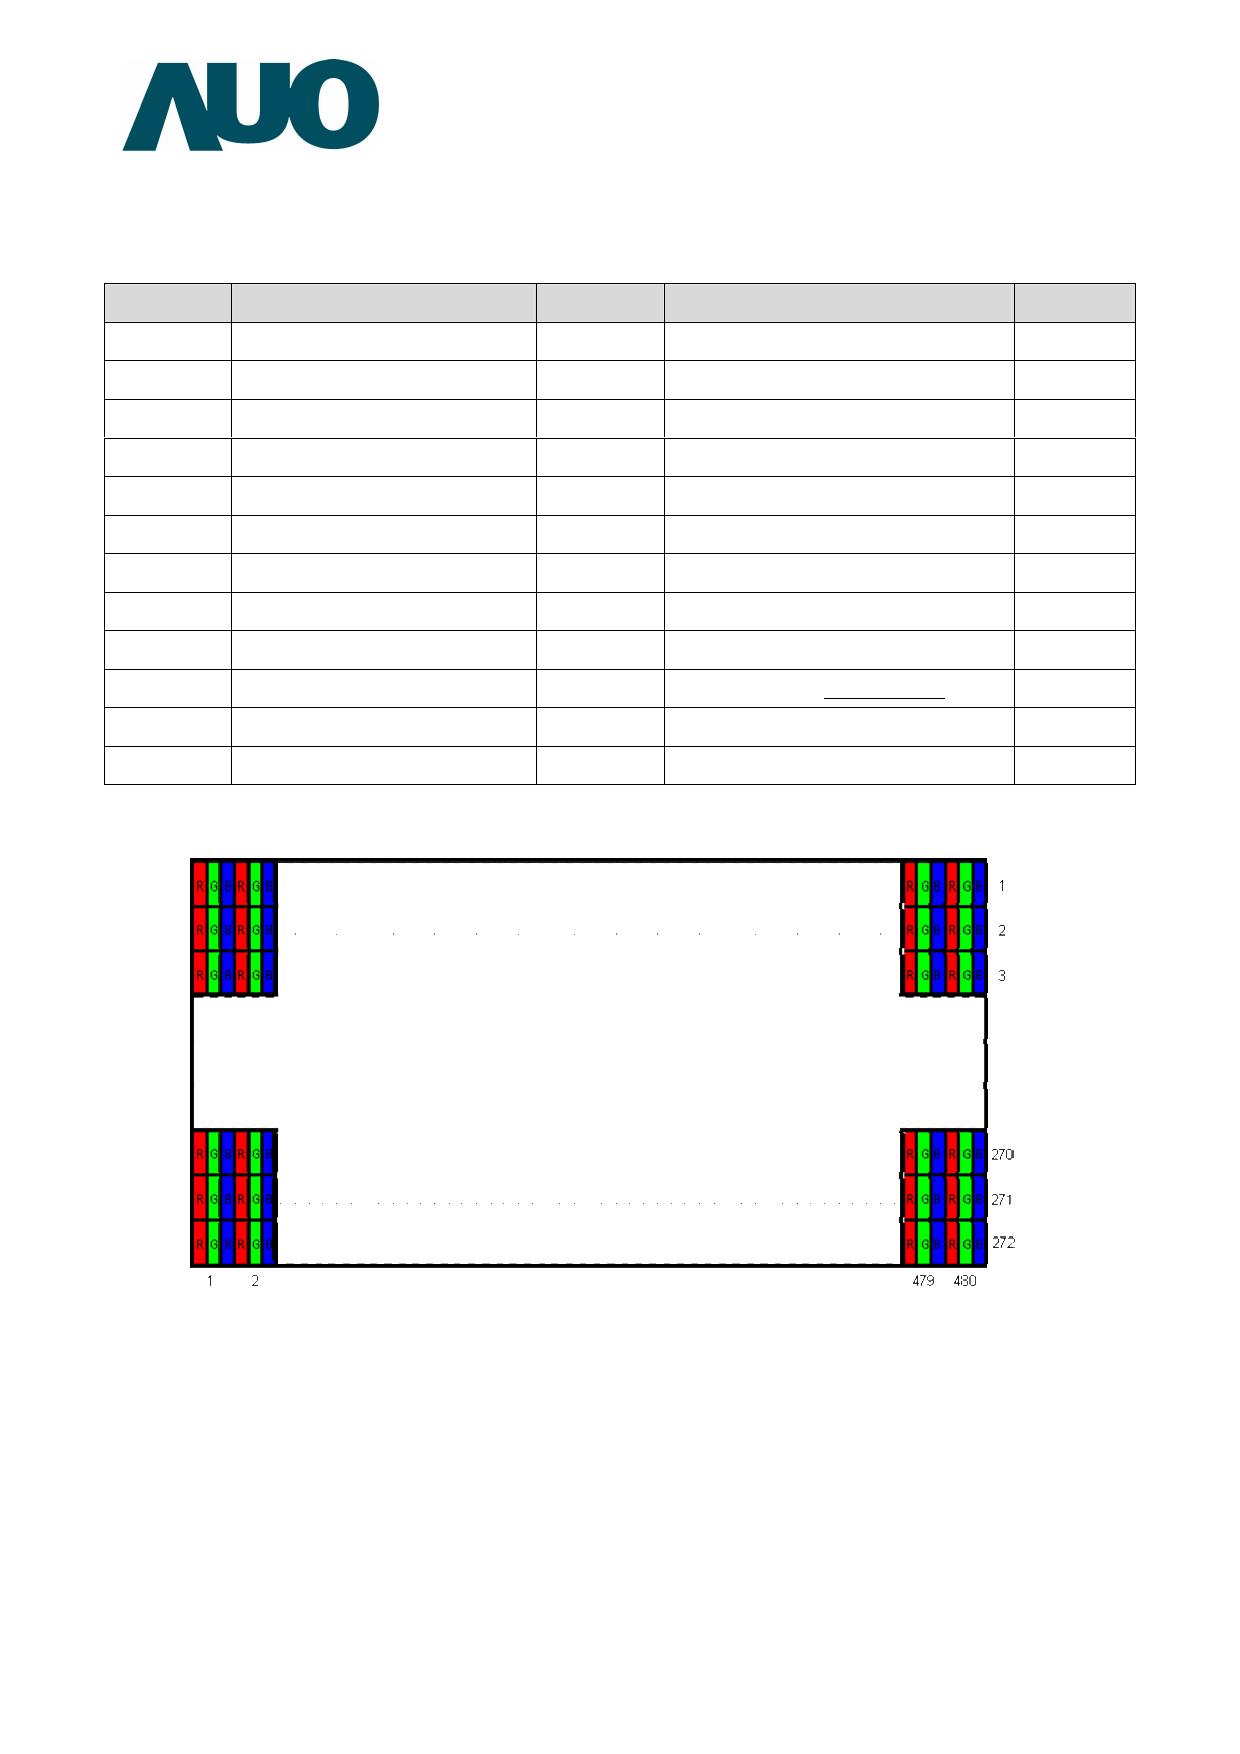 G043FTT01.0 pdf